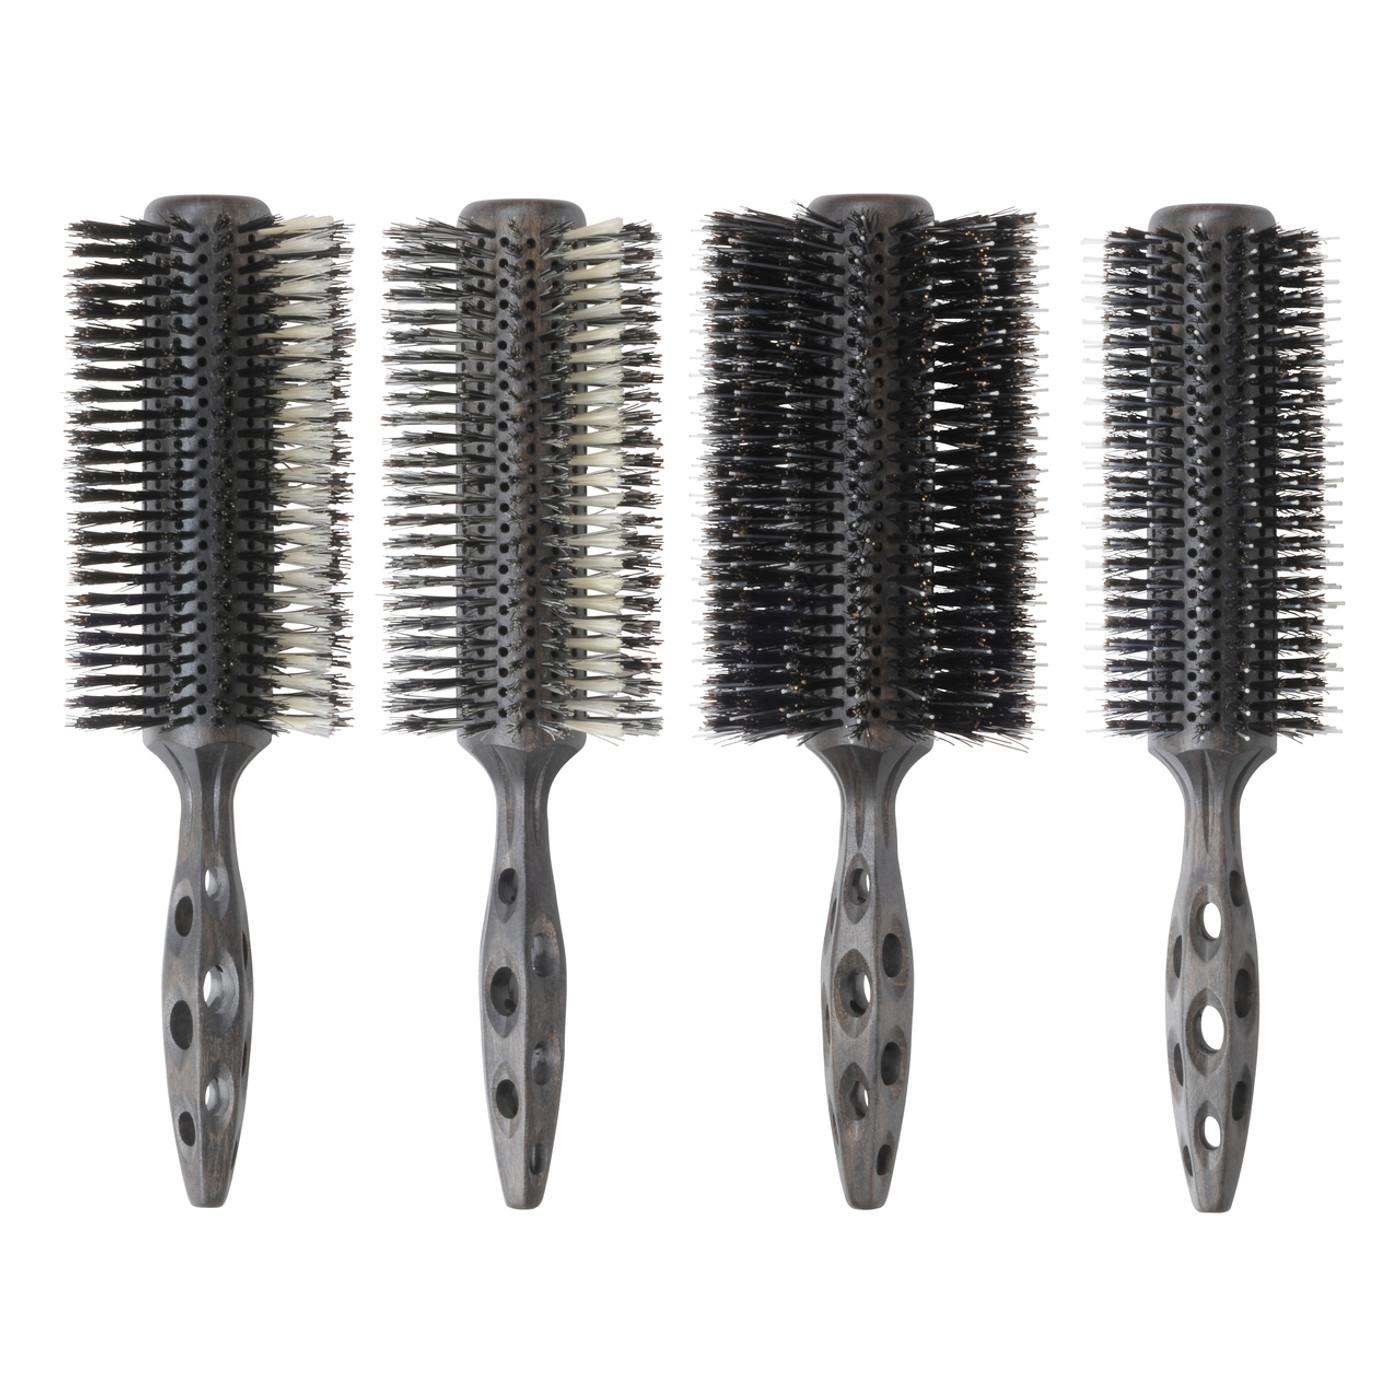 YS Park Extra Long Hairbrush Range